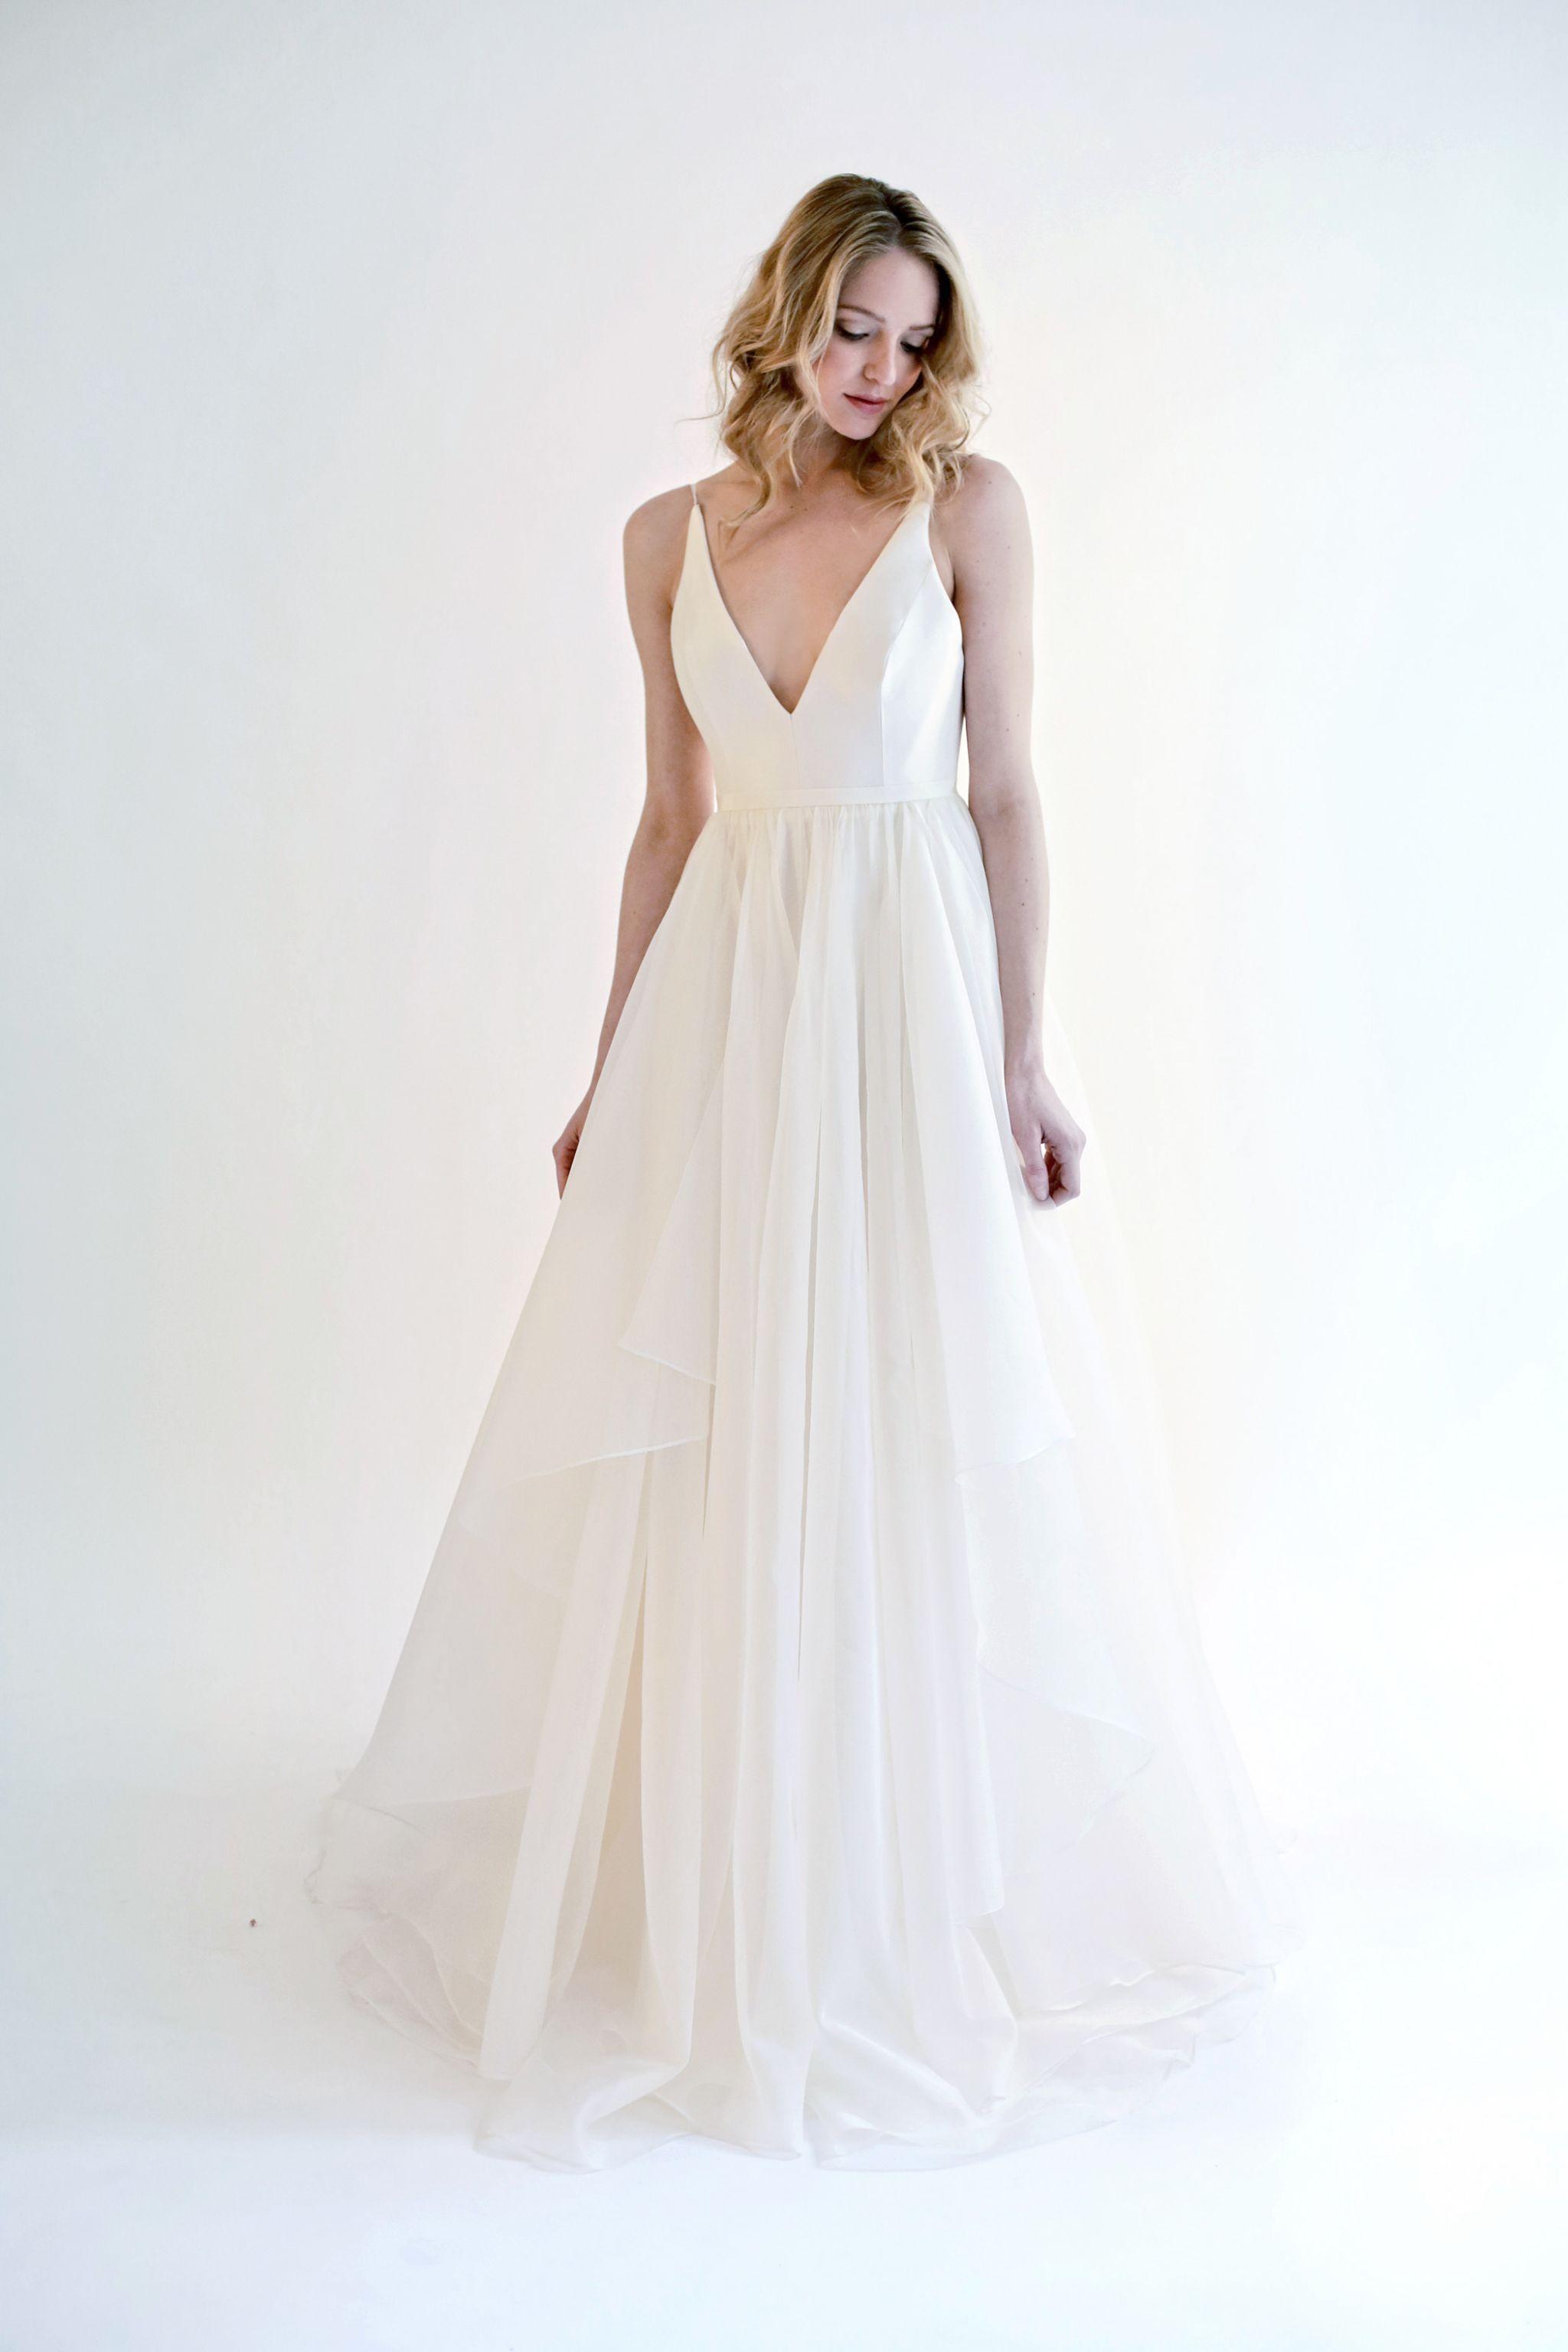 Leanne marshall gabrielle 1500 size 0 sample wedding dresses leanne marshall gabrielle 1500 size 0 sample wedding dresses ombrellifo Choice Image